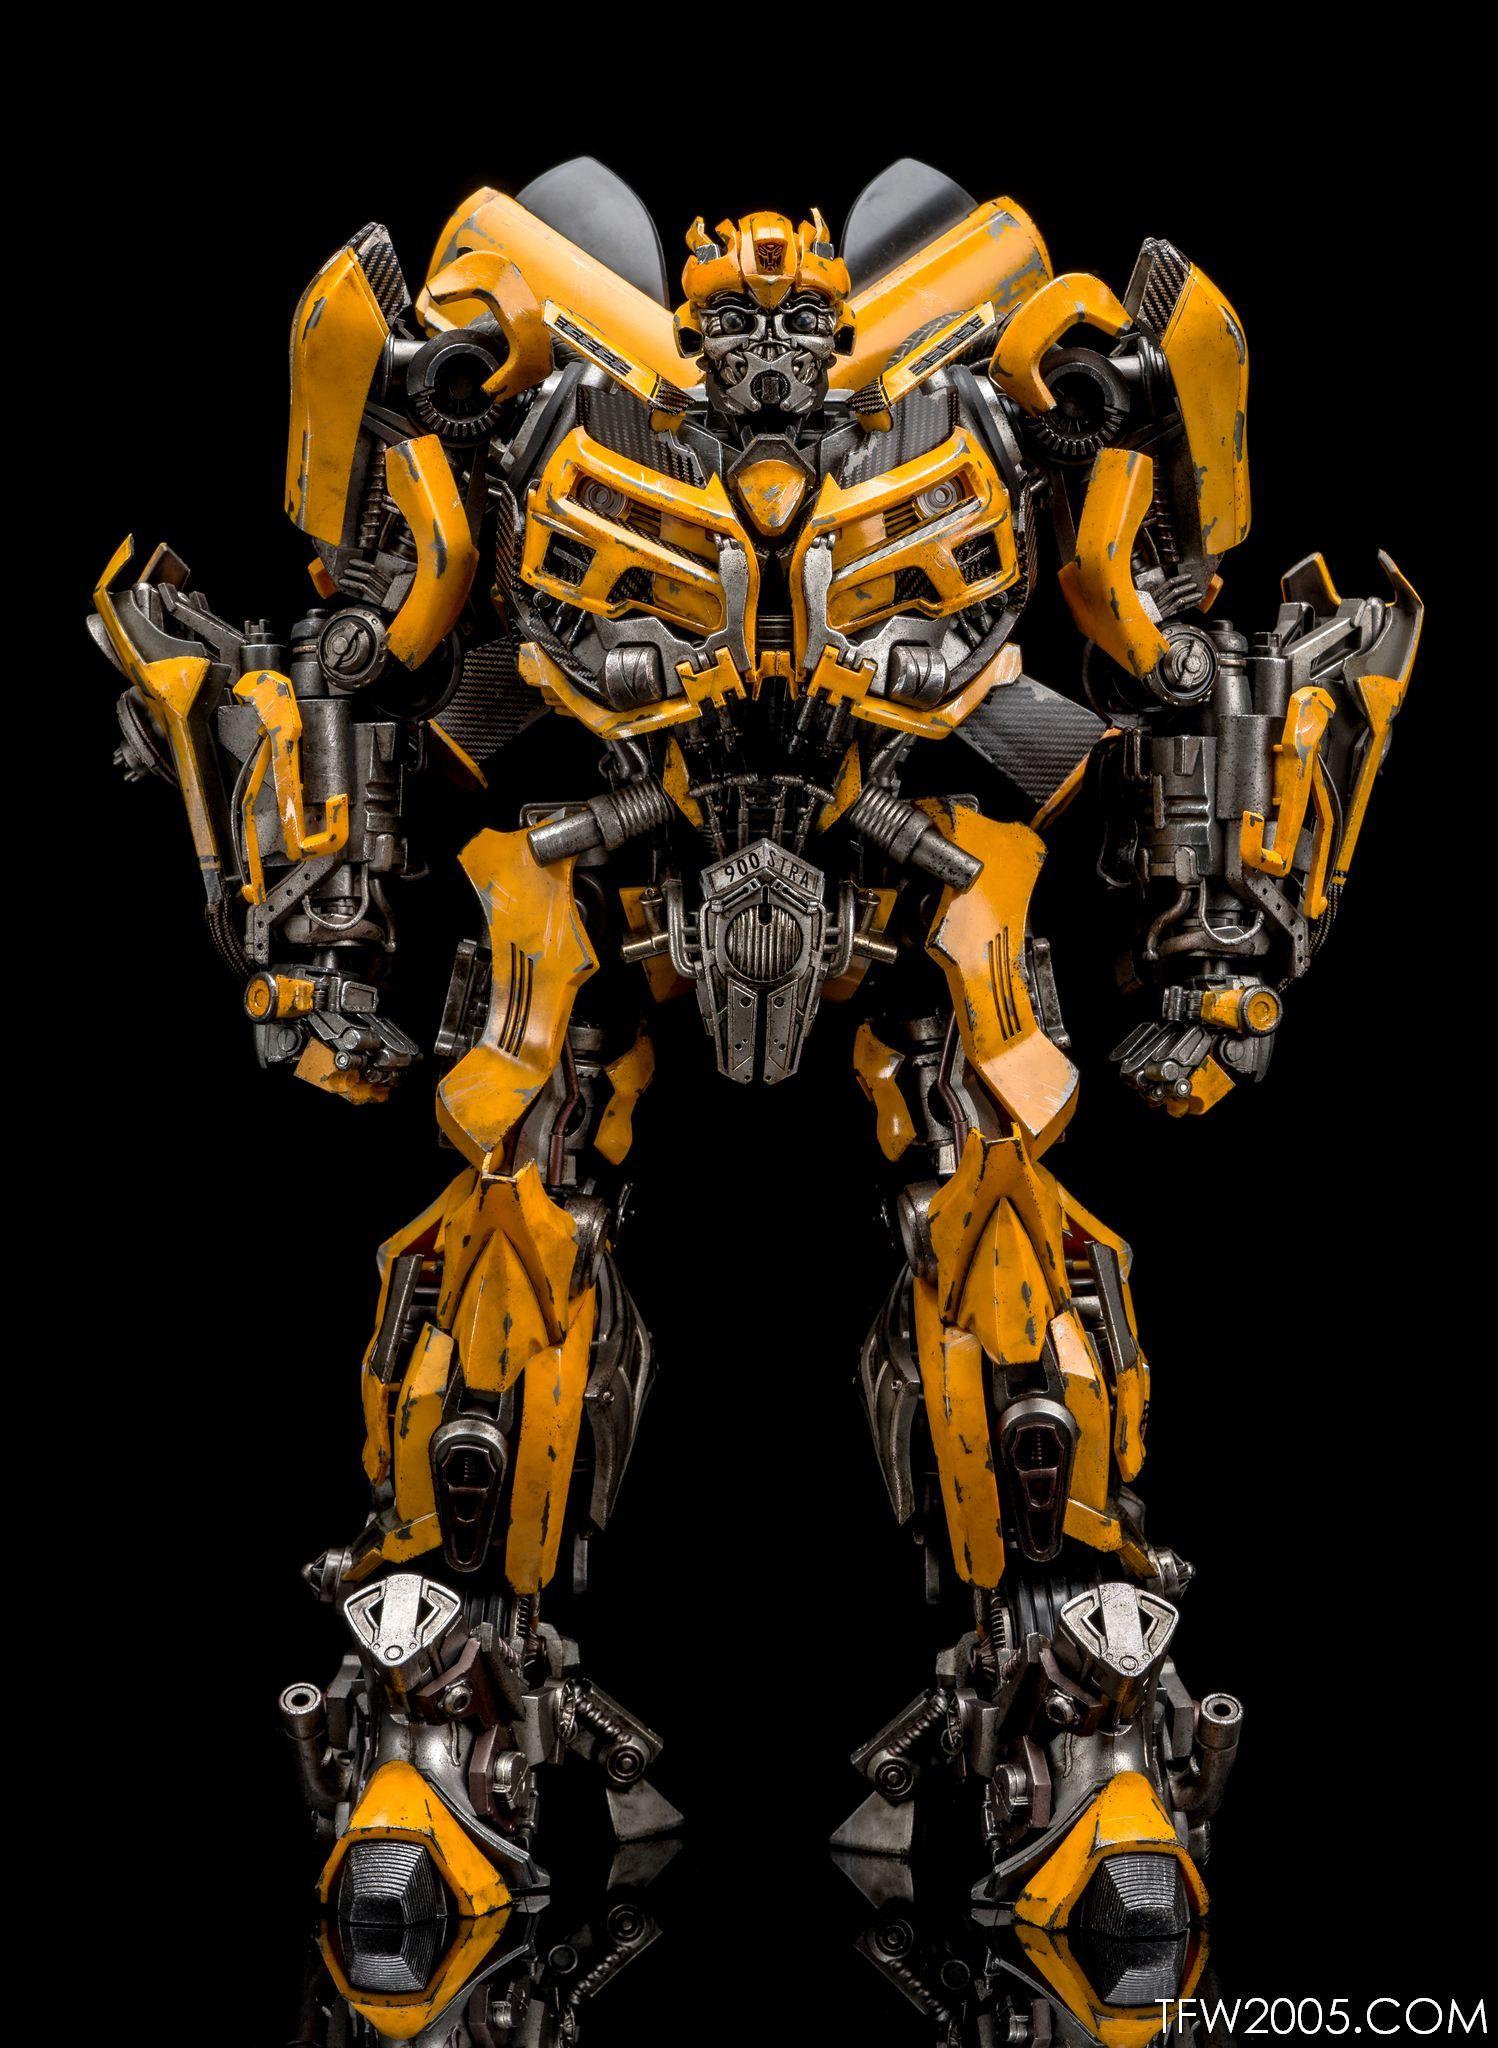 3A Bumblebee 011 | железо | Pinterest | Creatividad y Me gustas